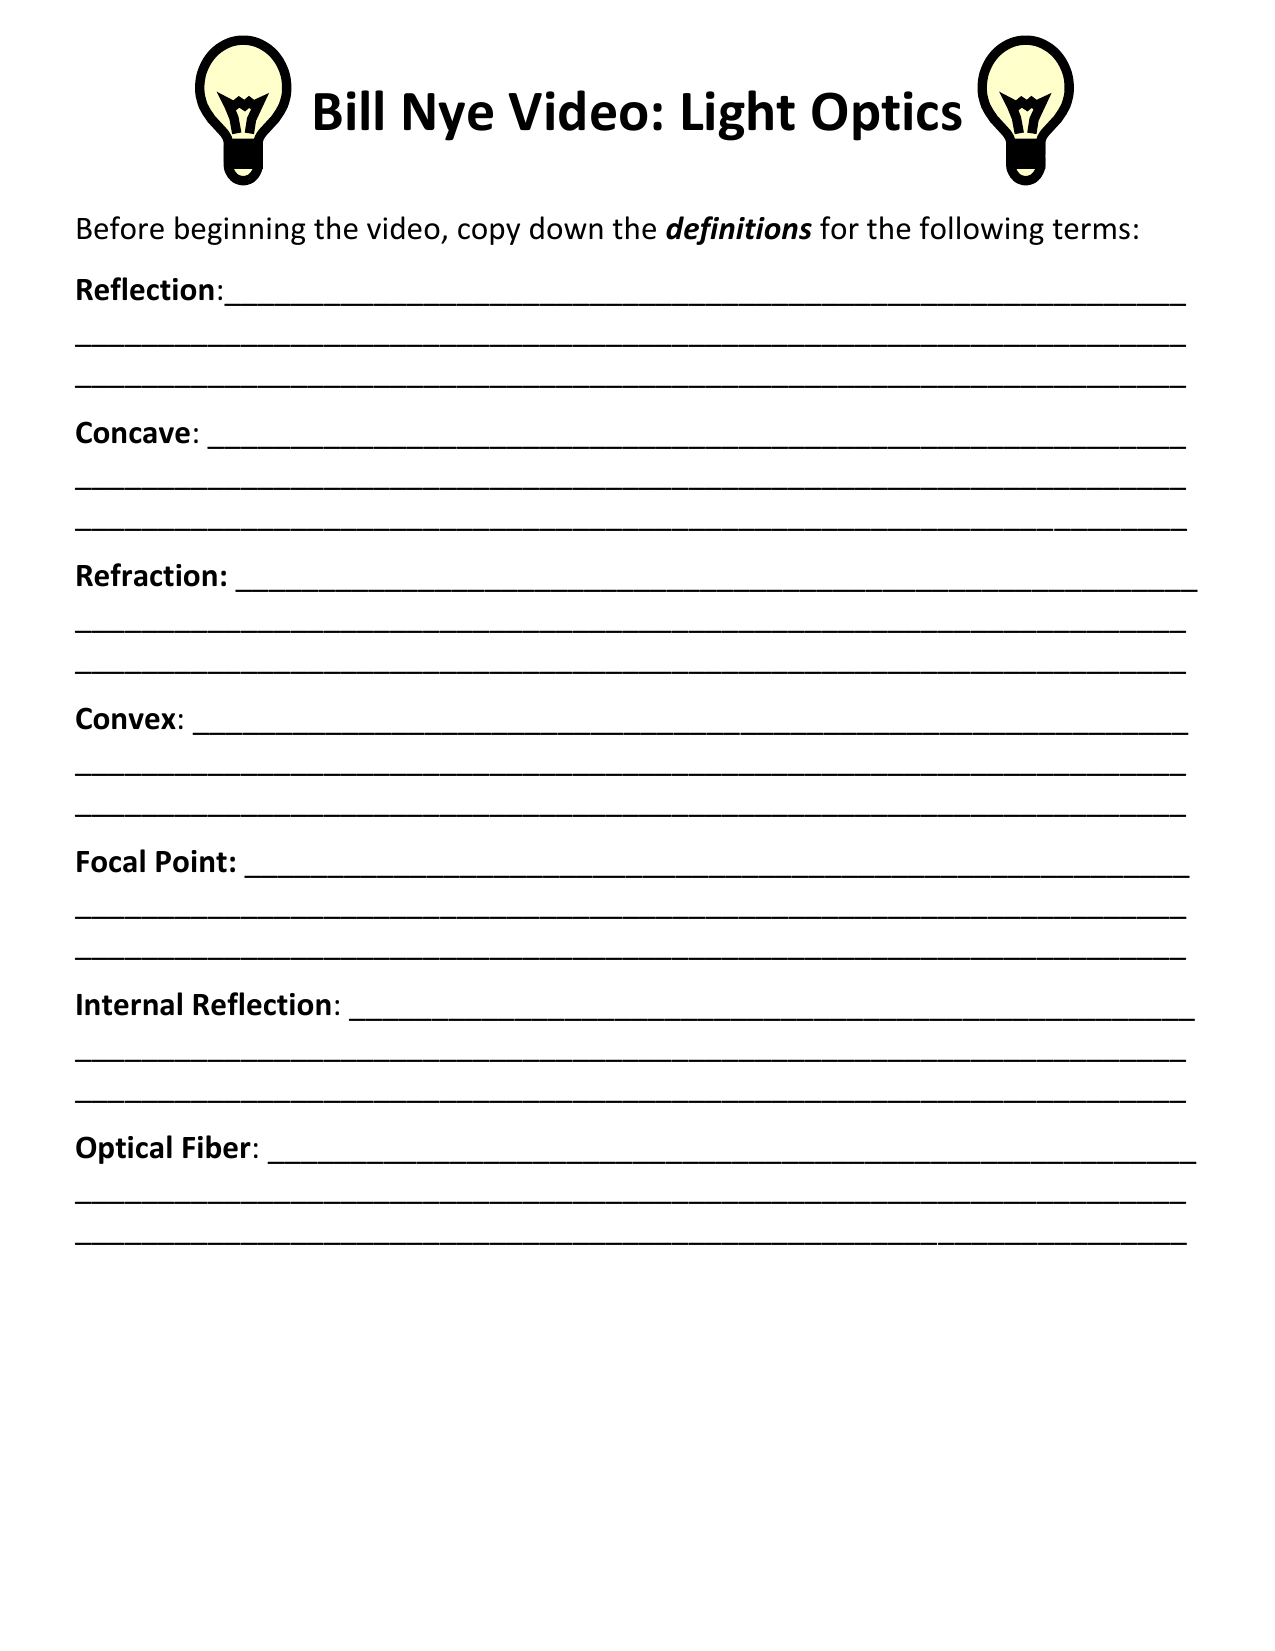 Printables Of Bill Nye Light Optics Worksheet Answers